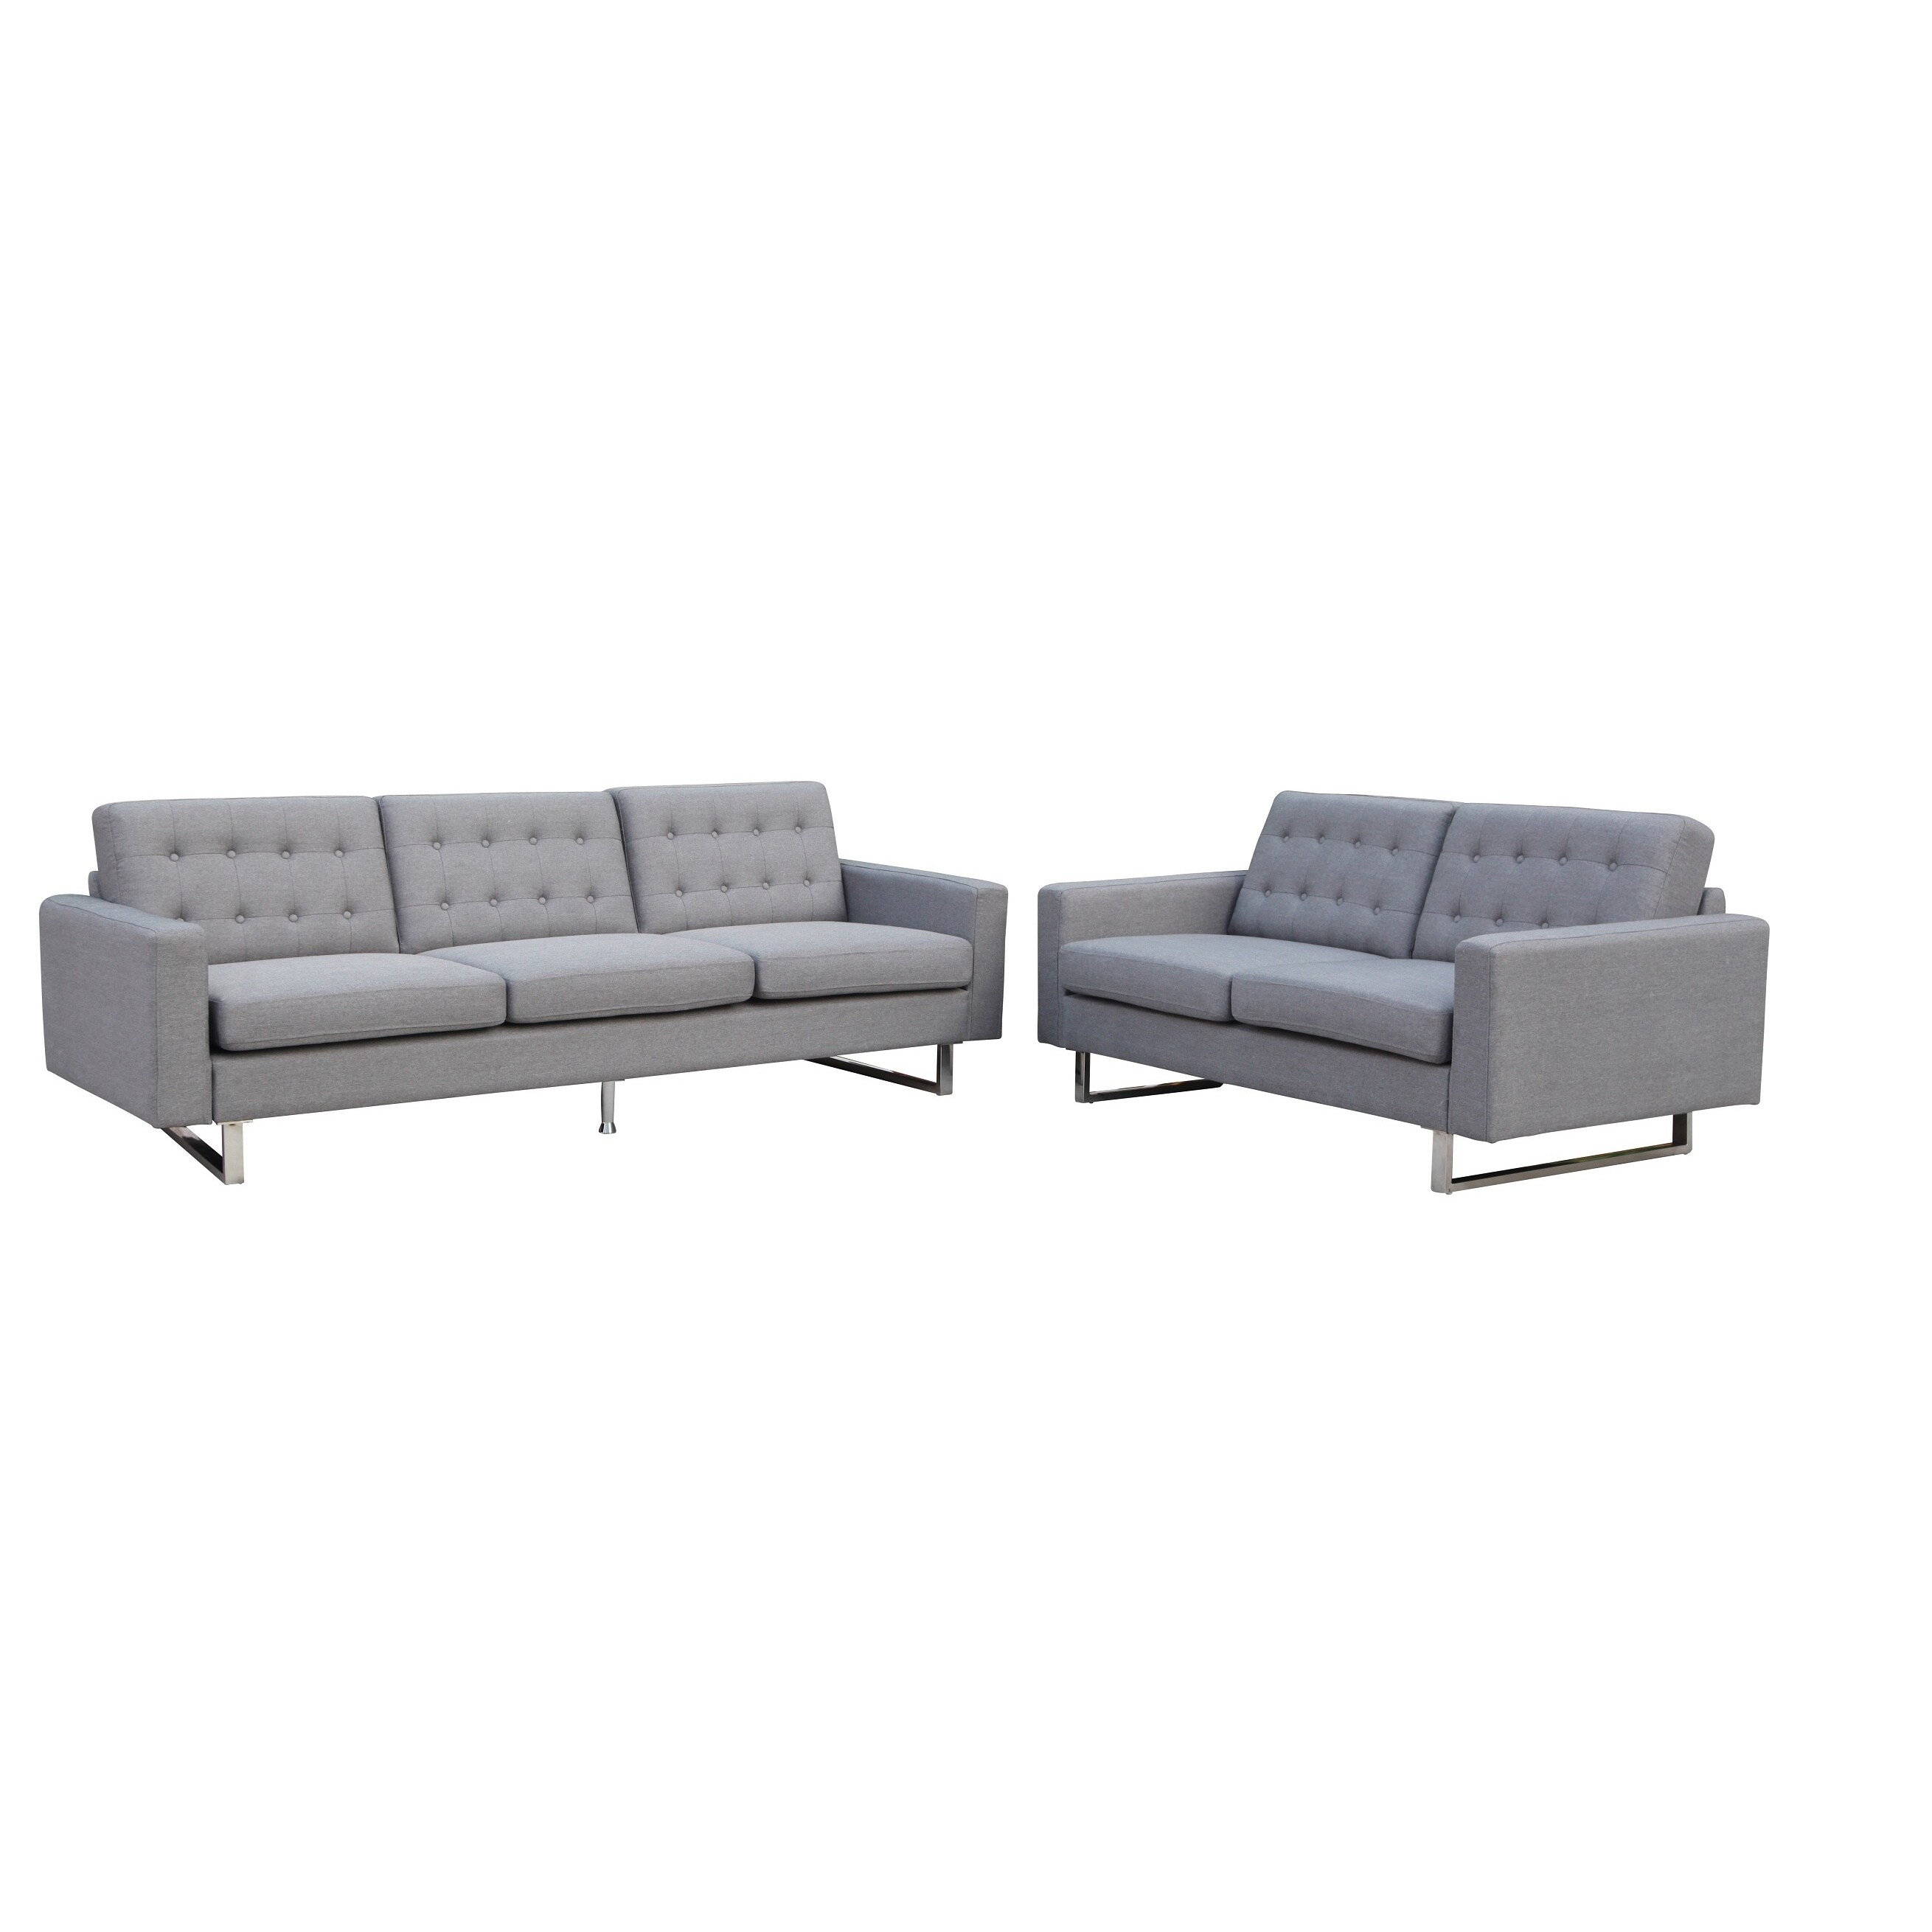 Mid-Century Modern Benava Fabric Sofa and Loveseat Set